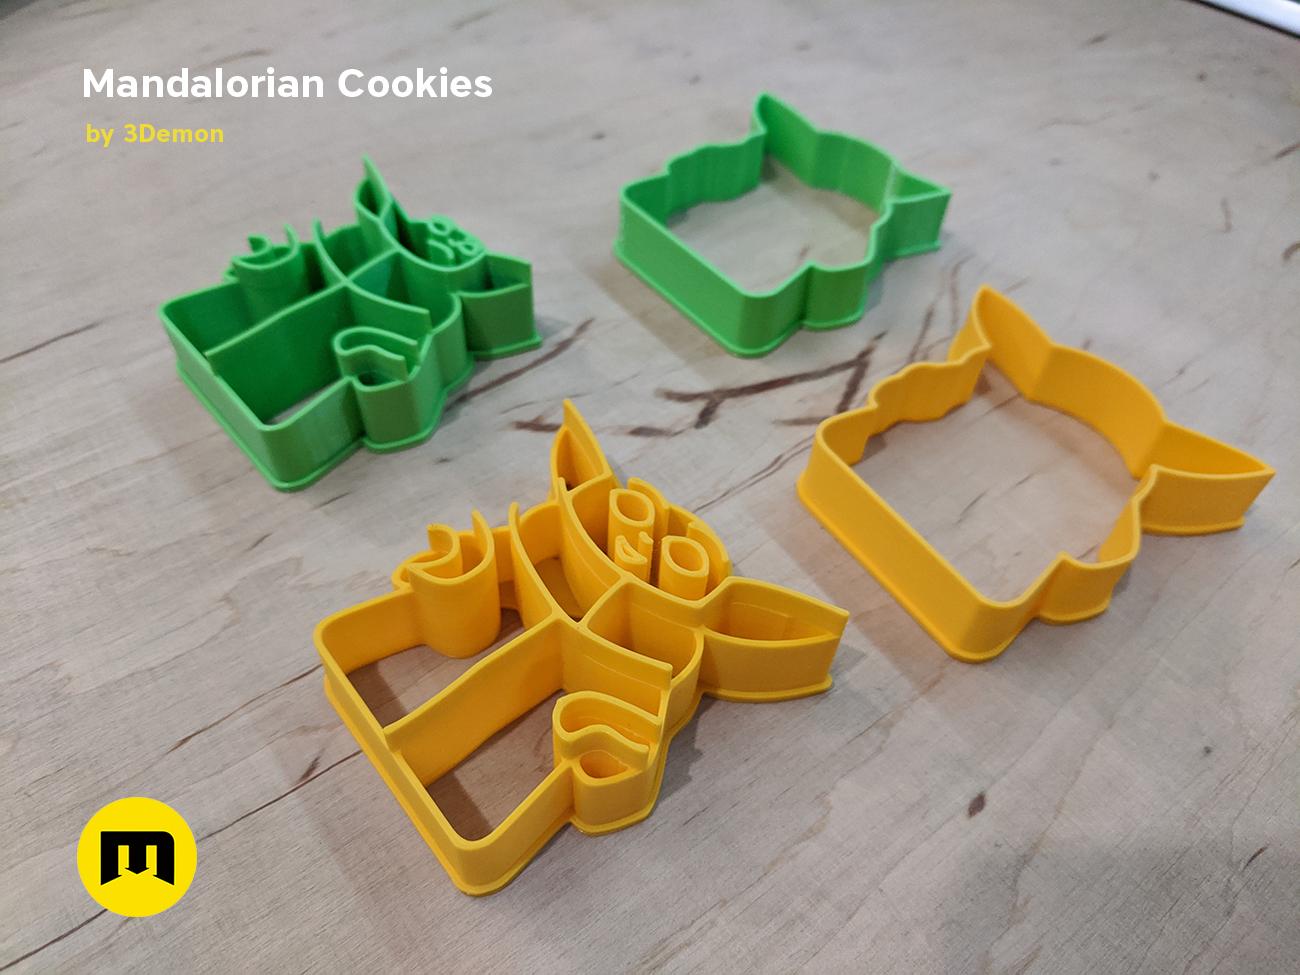 IMG_20191206_153252.png Download STL file Yoda Baby Cookie Cutter Mandalorian • 3D printer design, 3D-mon